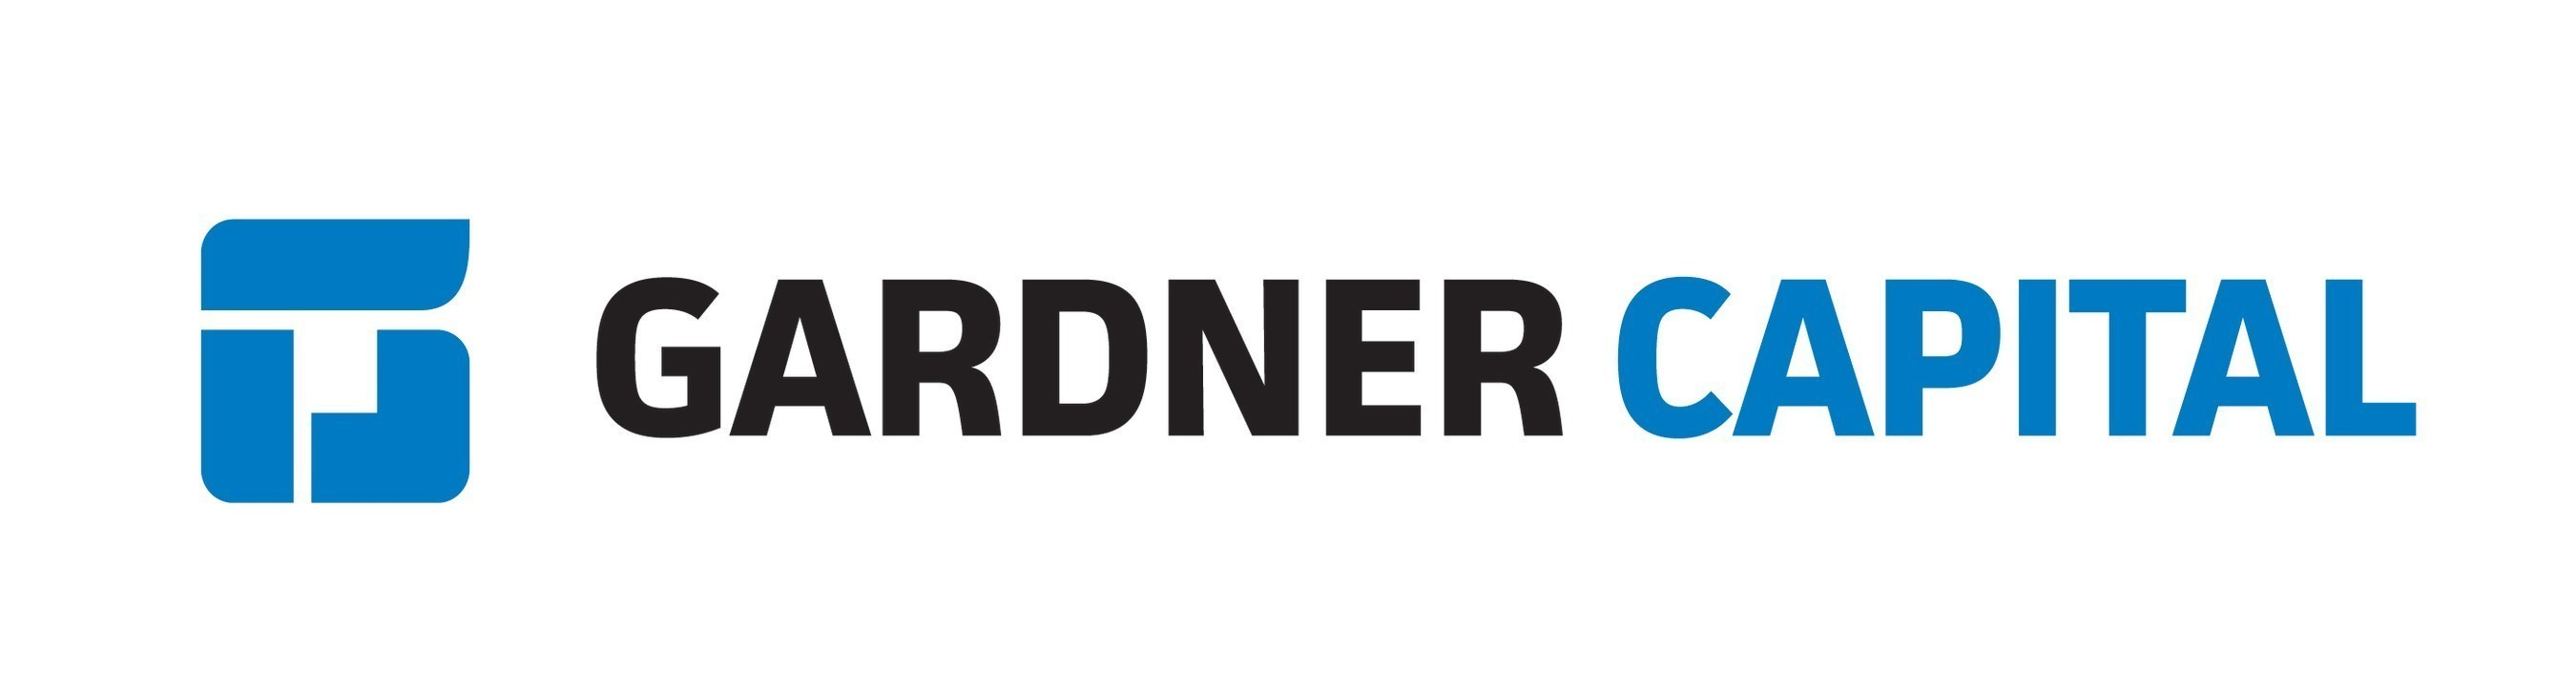 Gardner Capital logo.